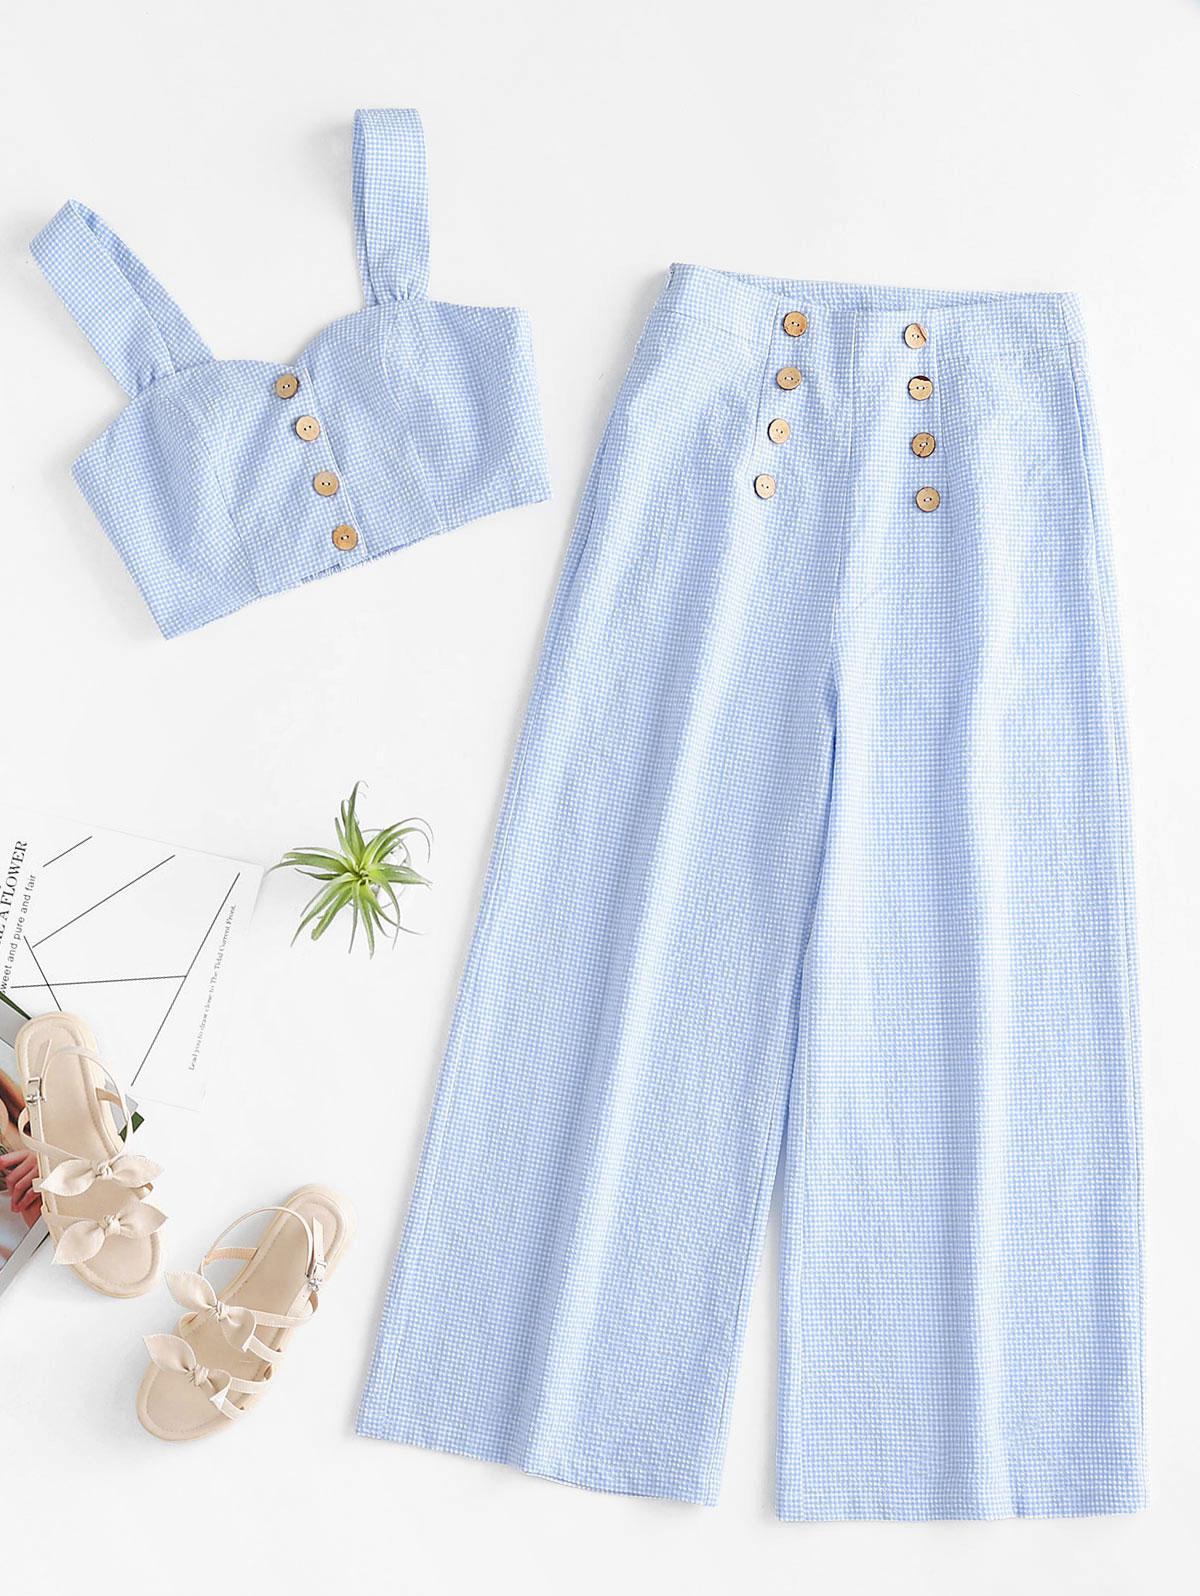 ZAFUL Buttoned Gingham Crop Top and Wide Leg Pants Set, Light blue